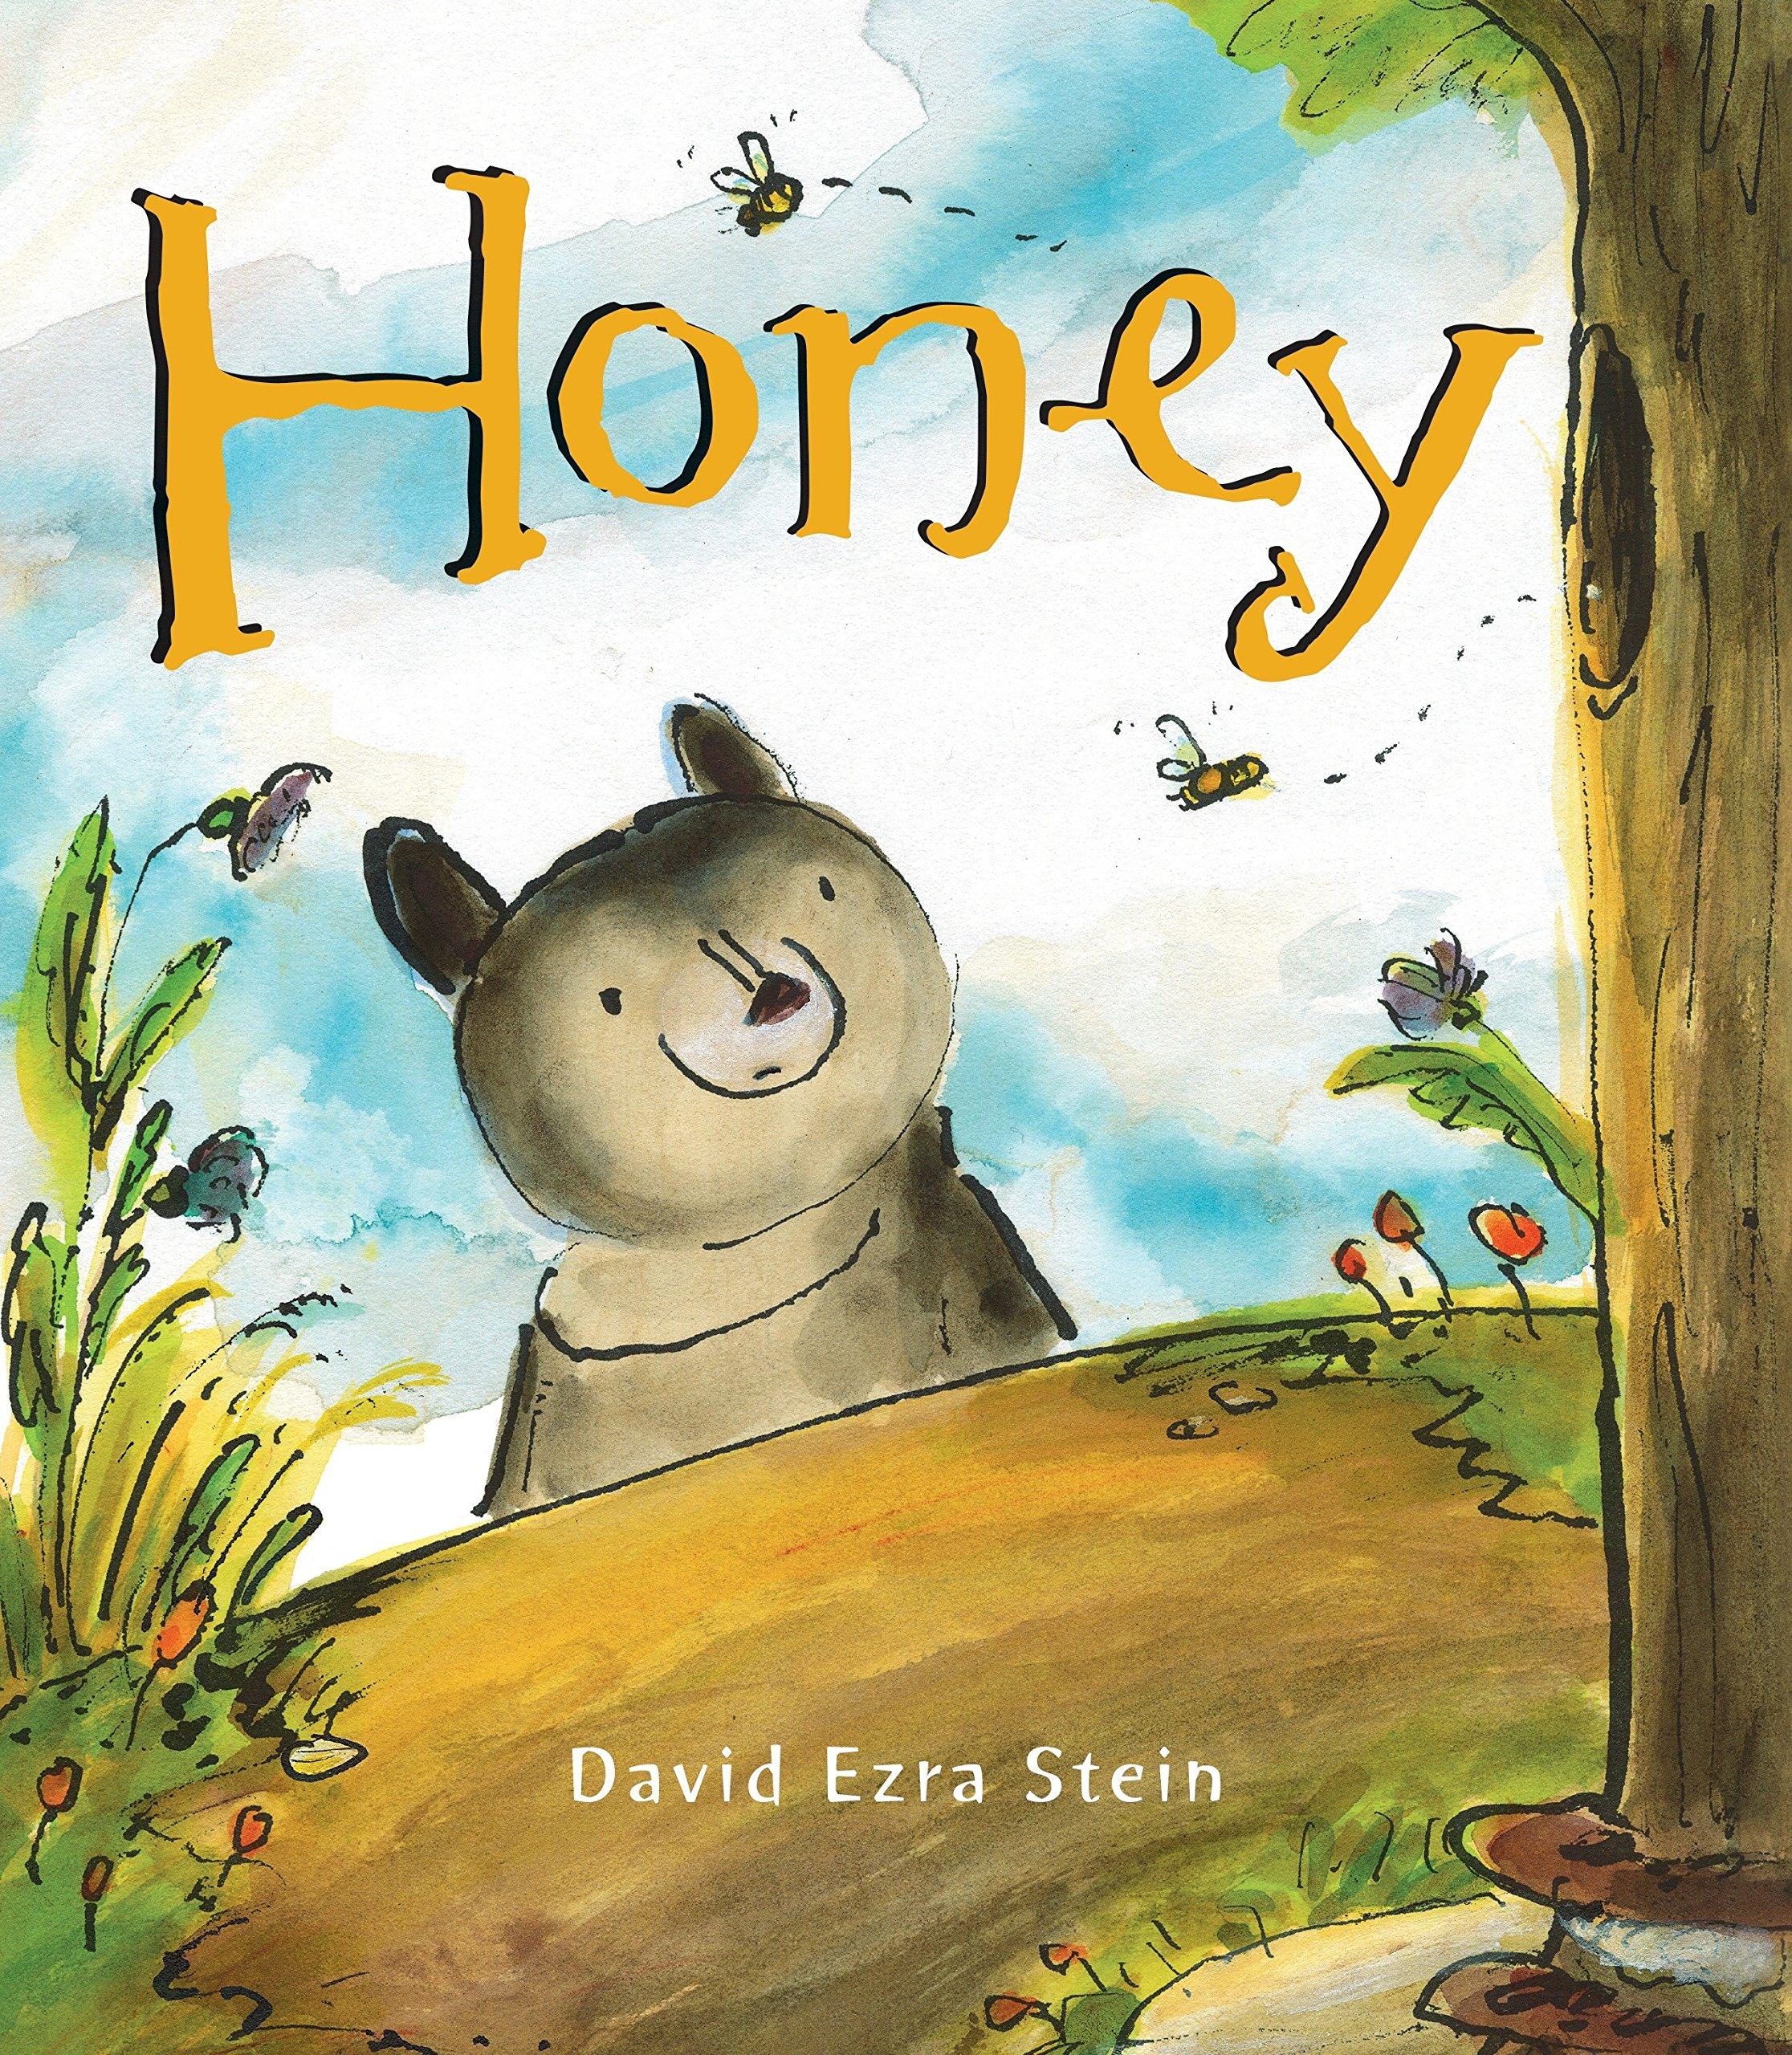 Image result for honey david ezra stein